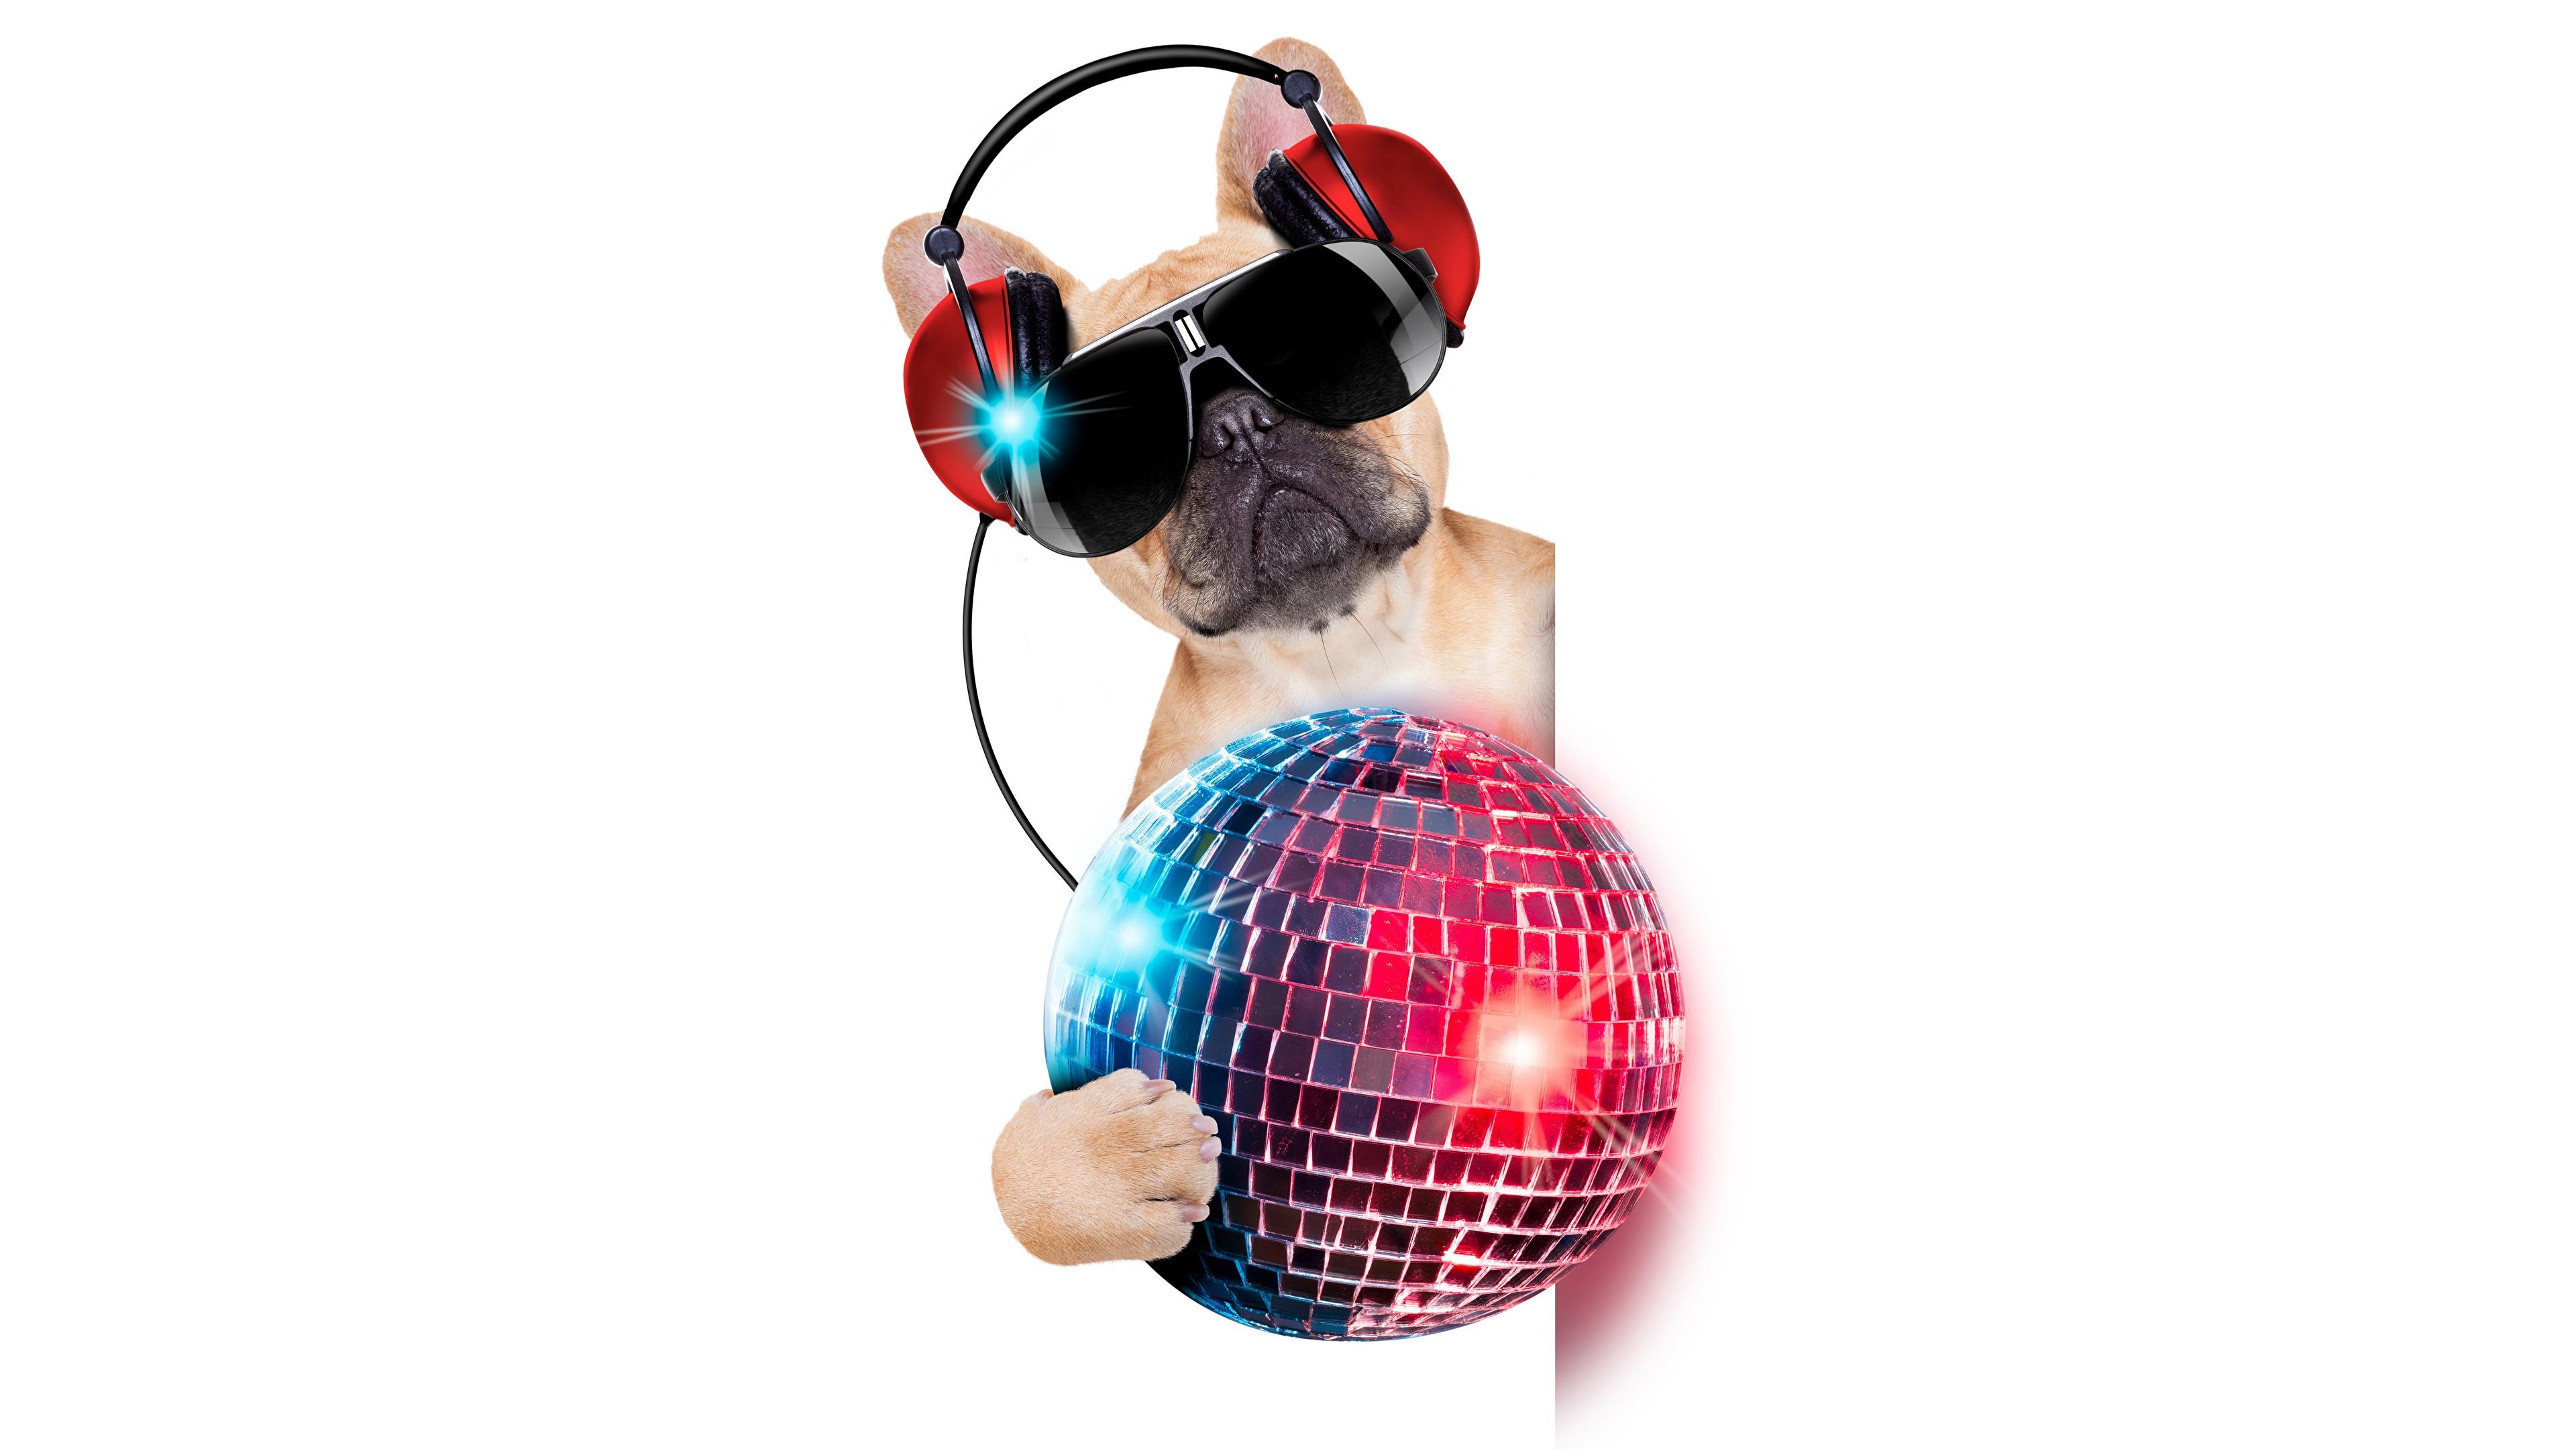 Photo French Bulldog Dogs Funny Balls Glasses Animals 3840x2160